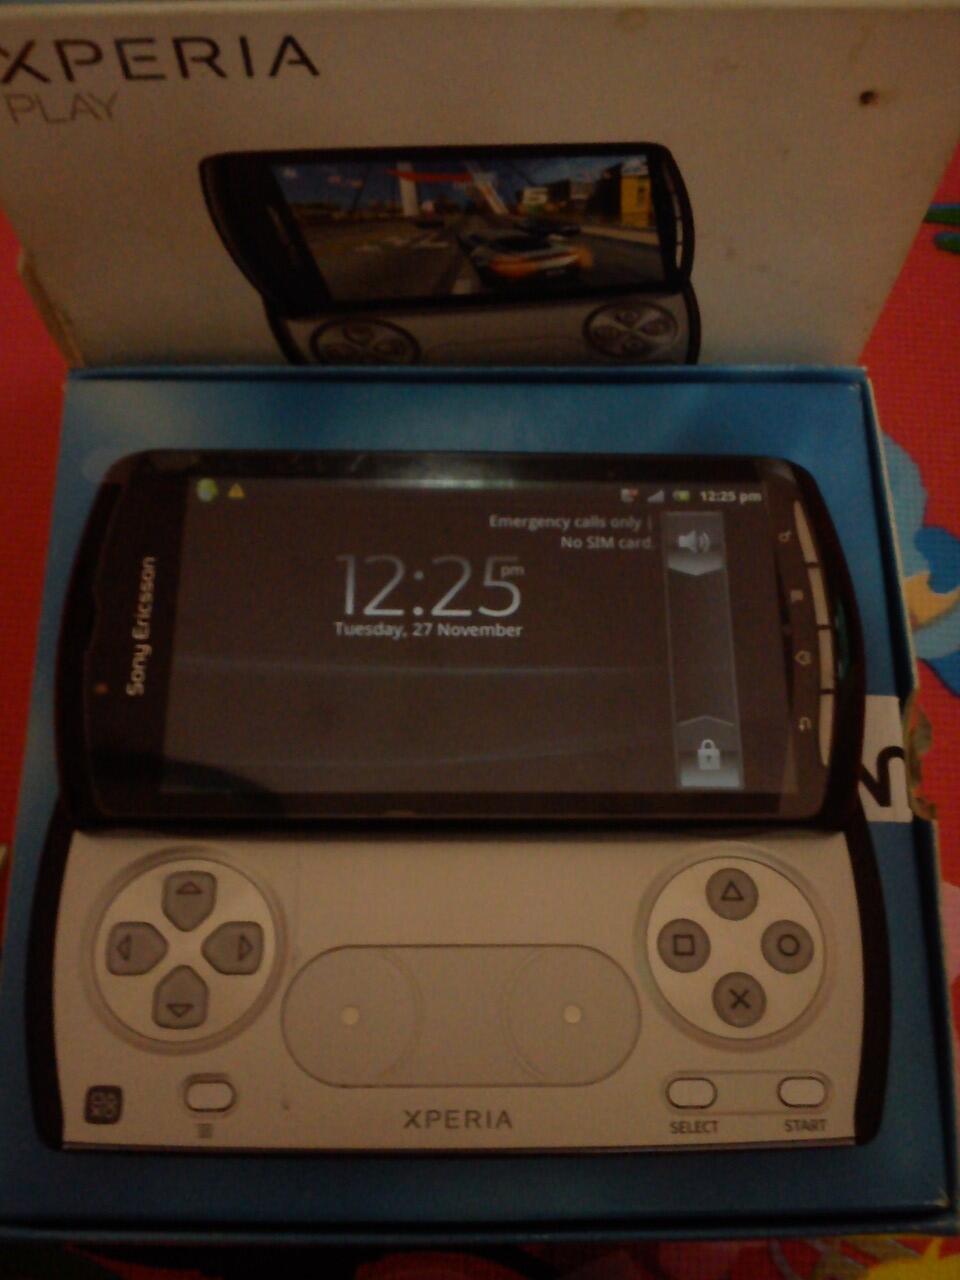 Sony Xperia J & Xperia Play